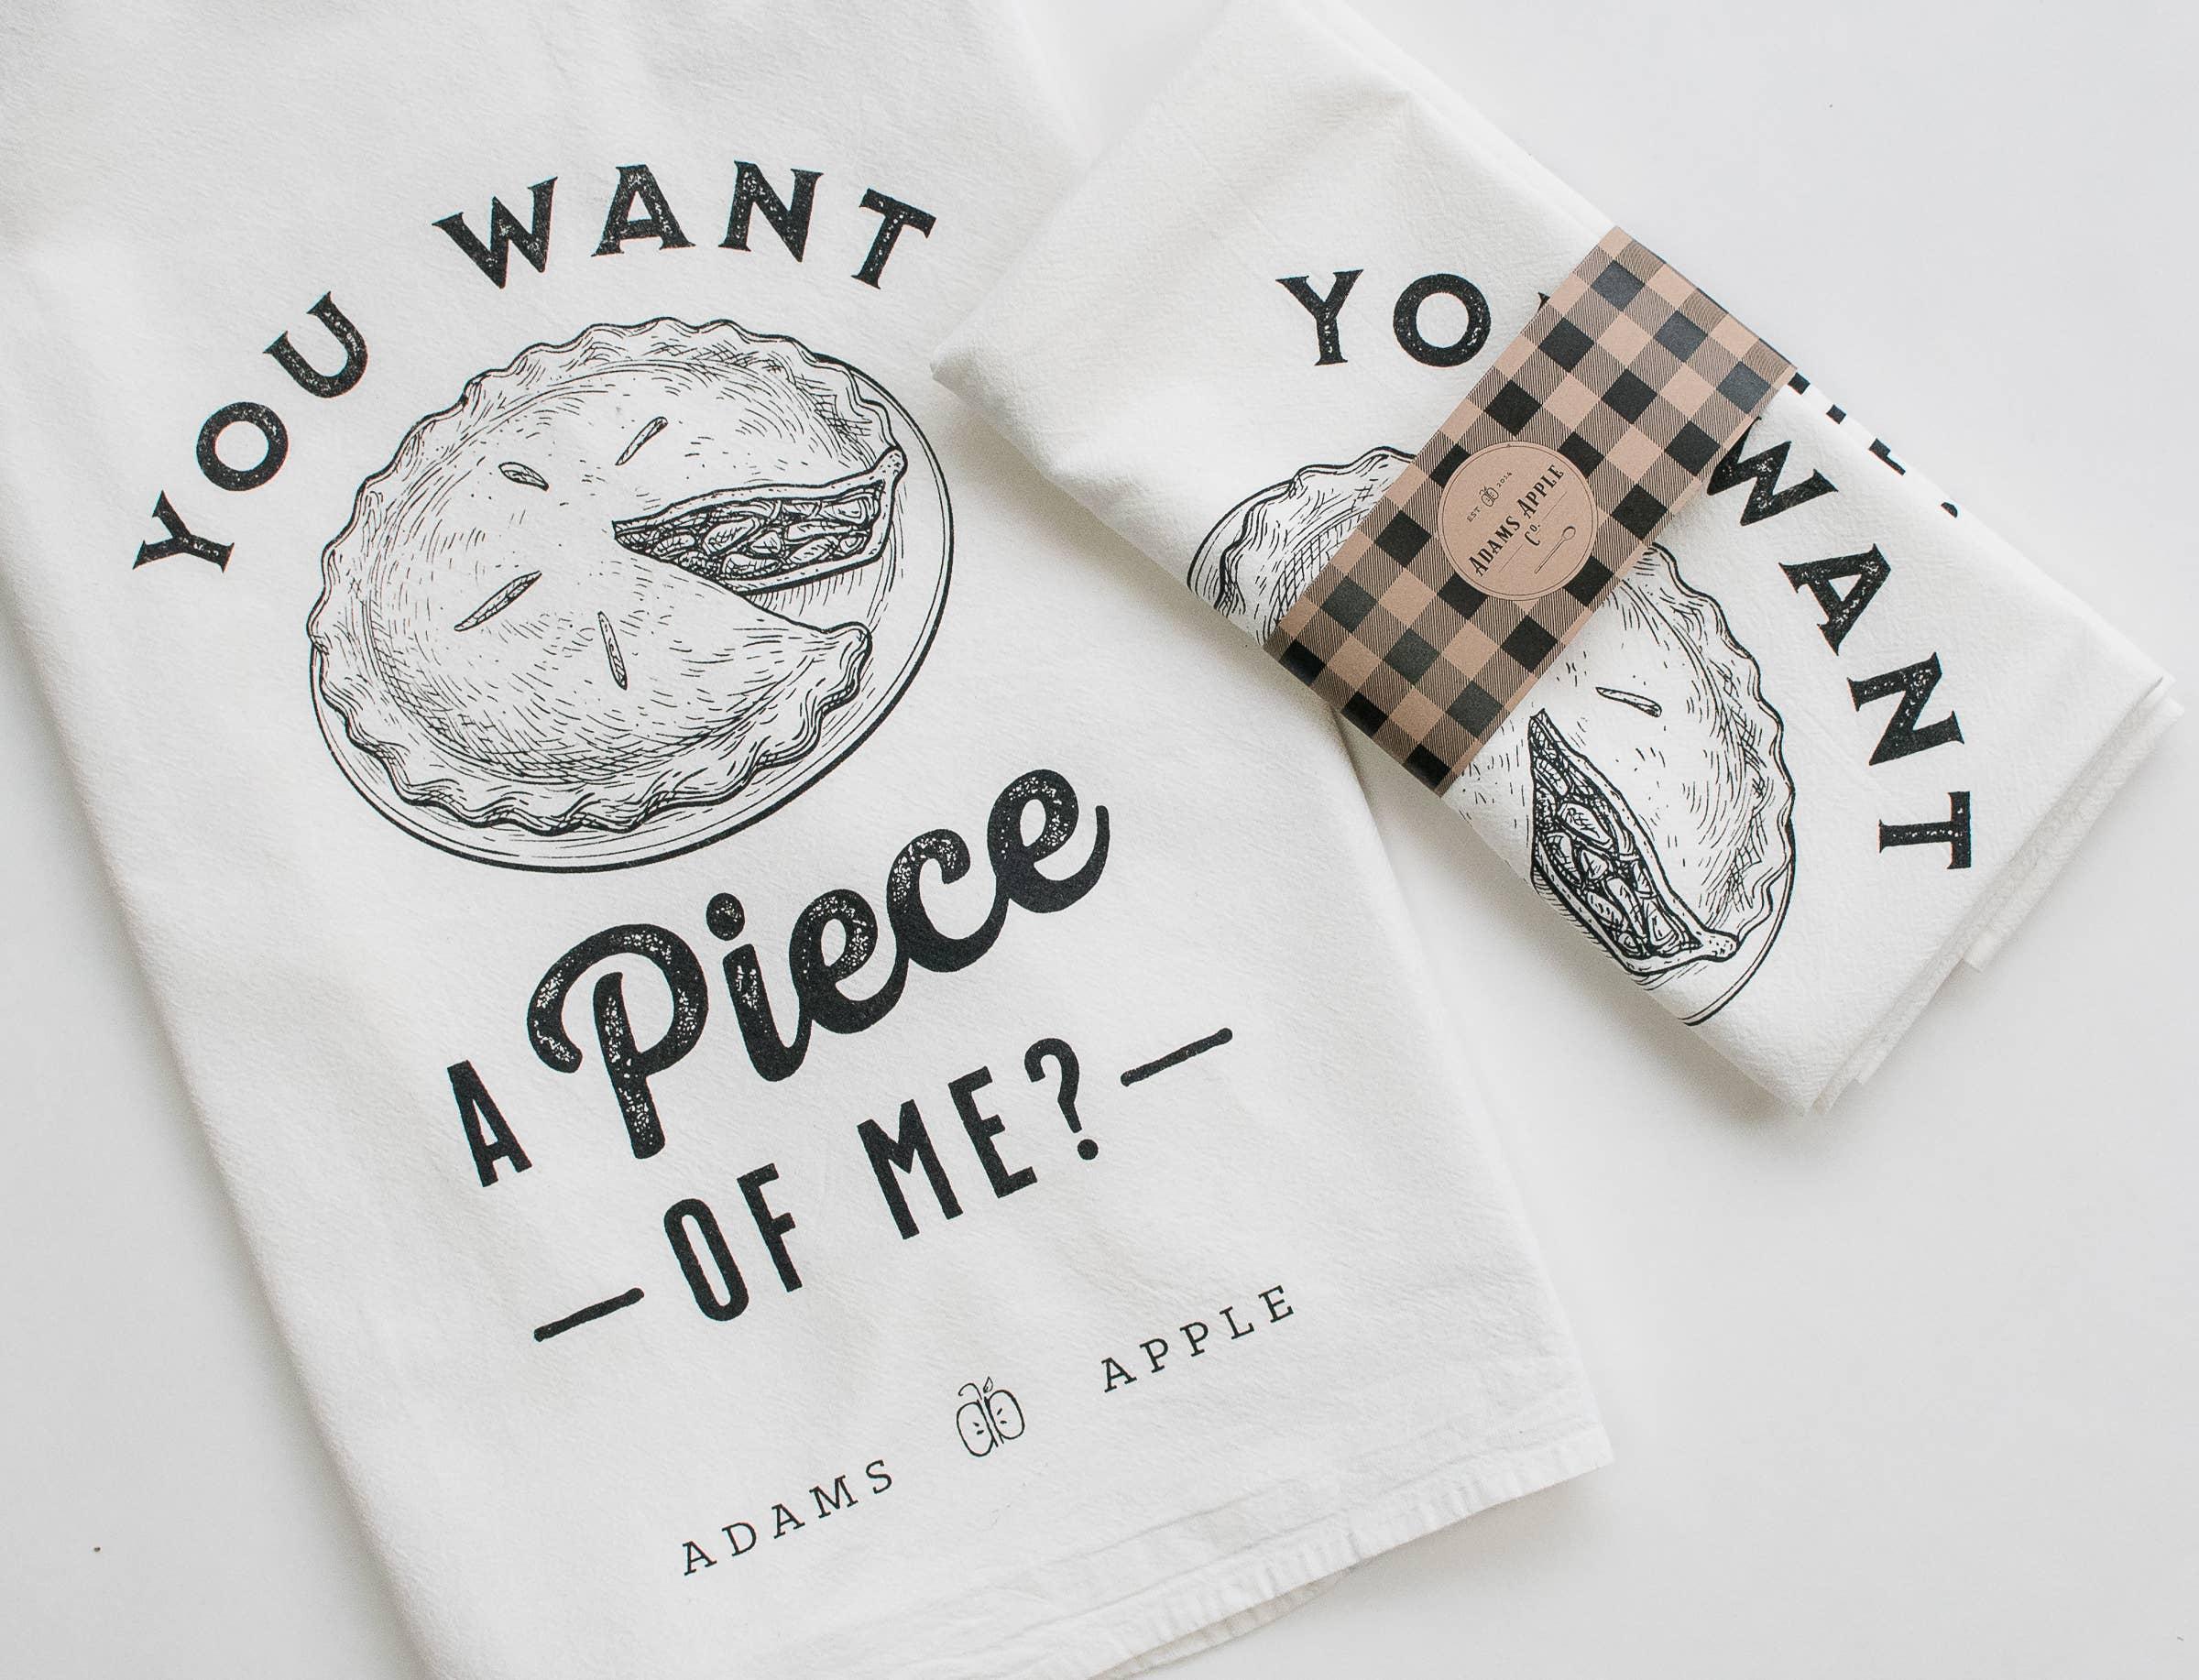 You Want a Piece of Me Flour Sack Towel | Trada Marketplace